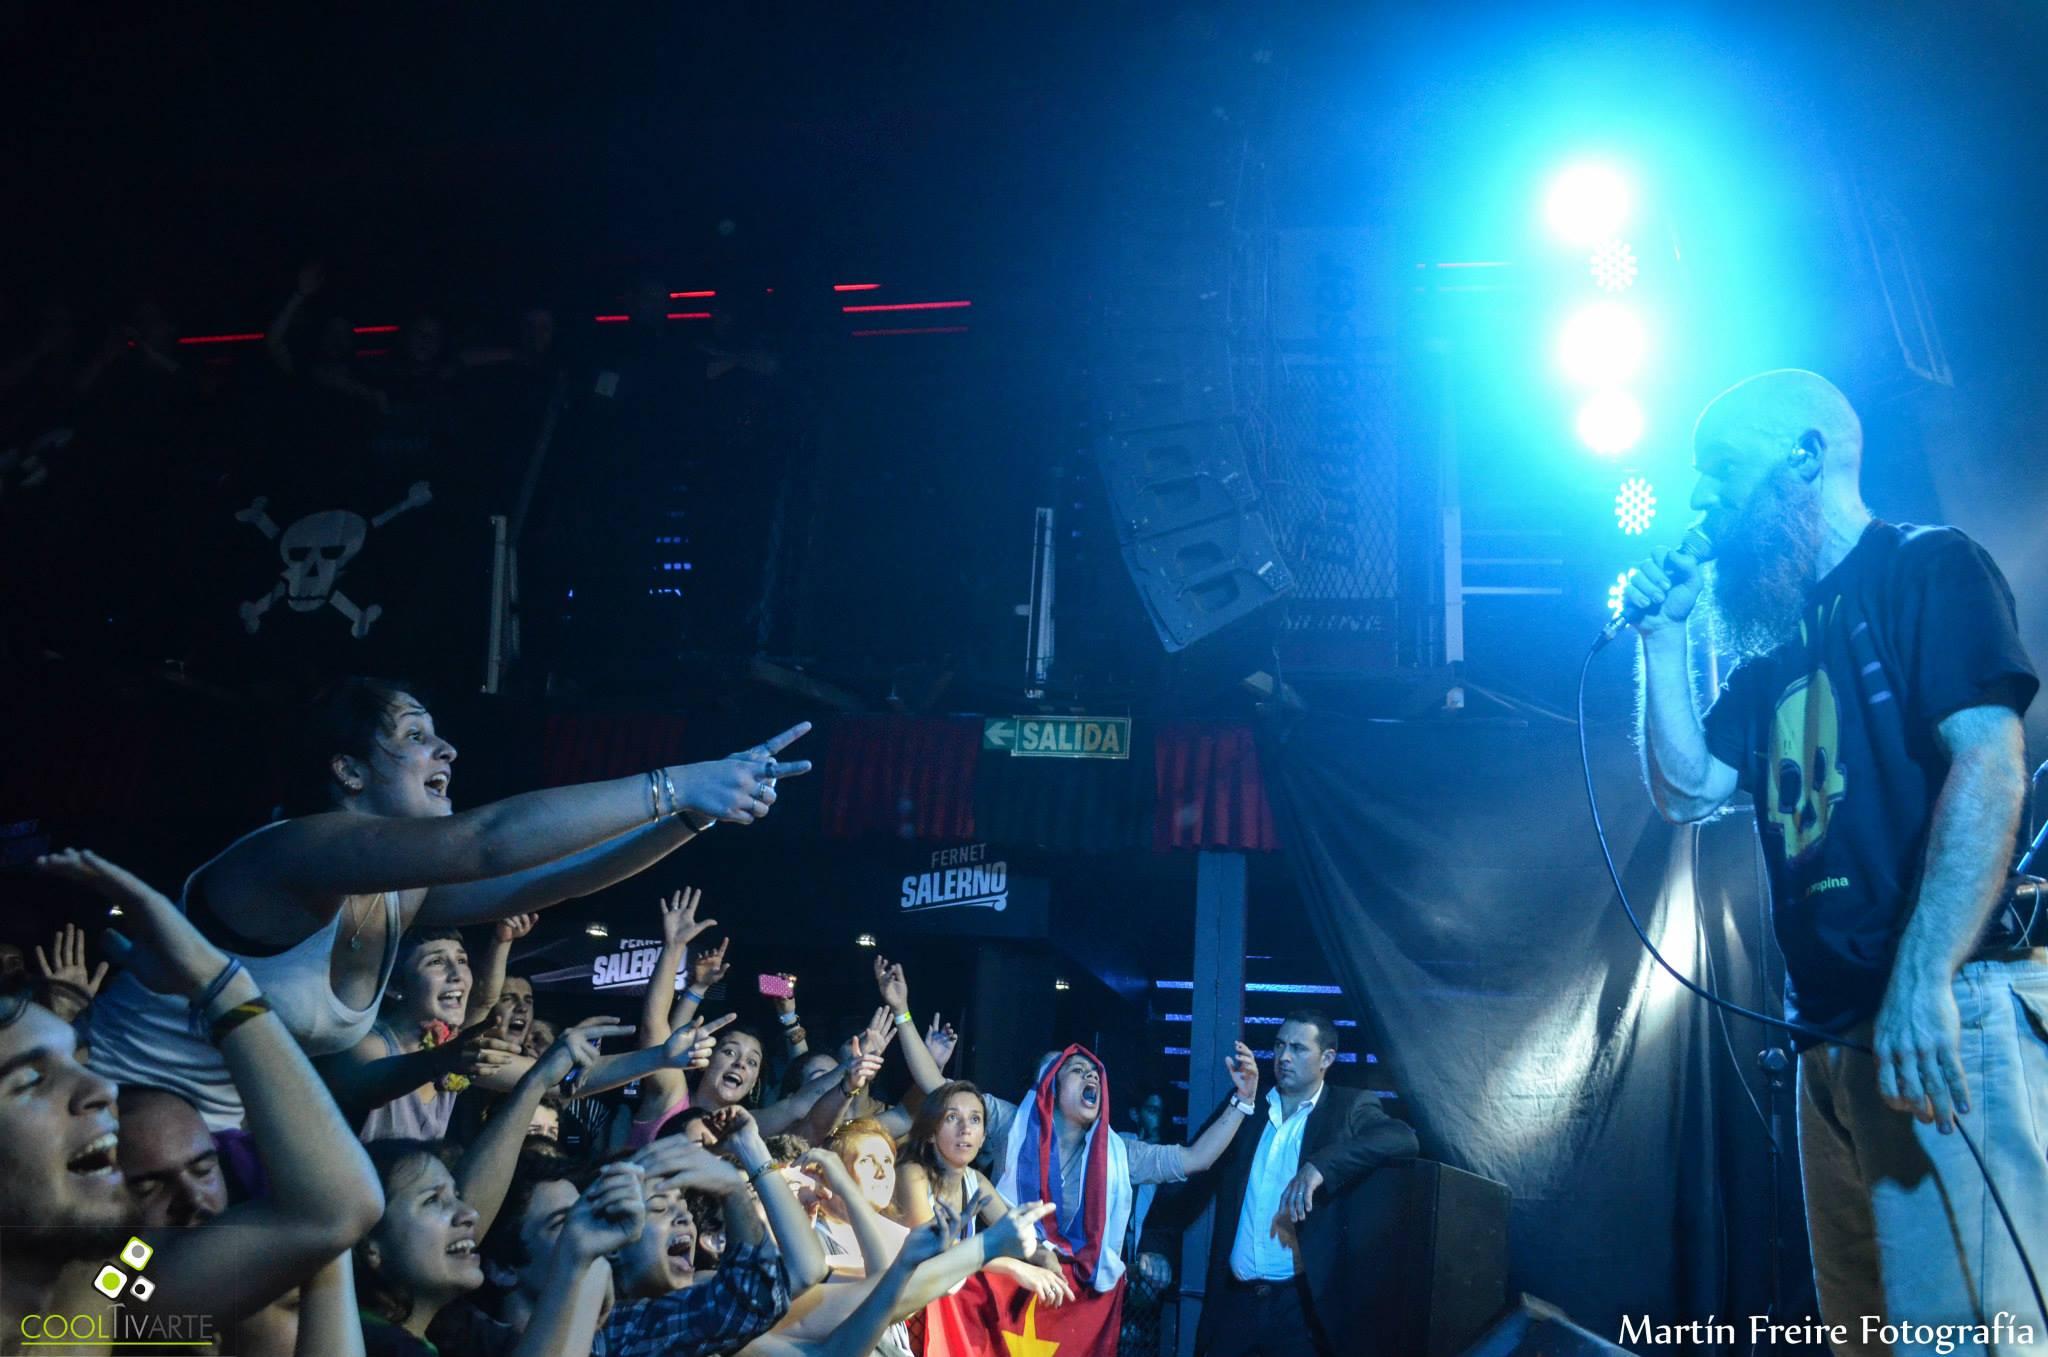 cooltivarte - Cuatro Pesos de Propina - 8 de agosto 2015 - Montevideo Music Box - Foto ©Martín Freire